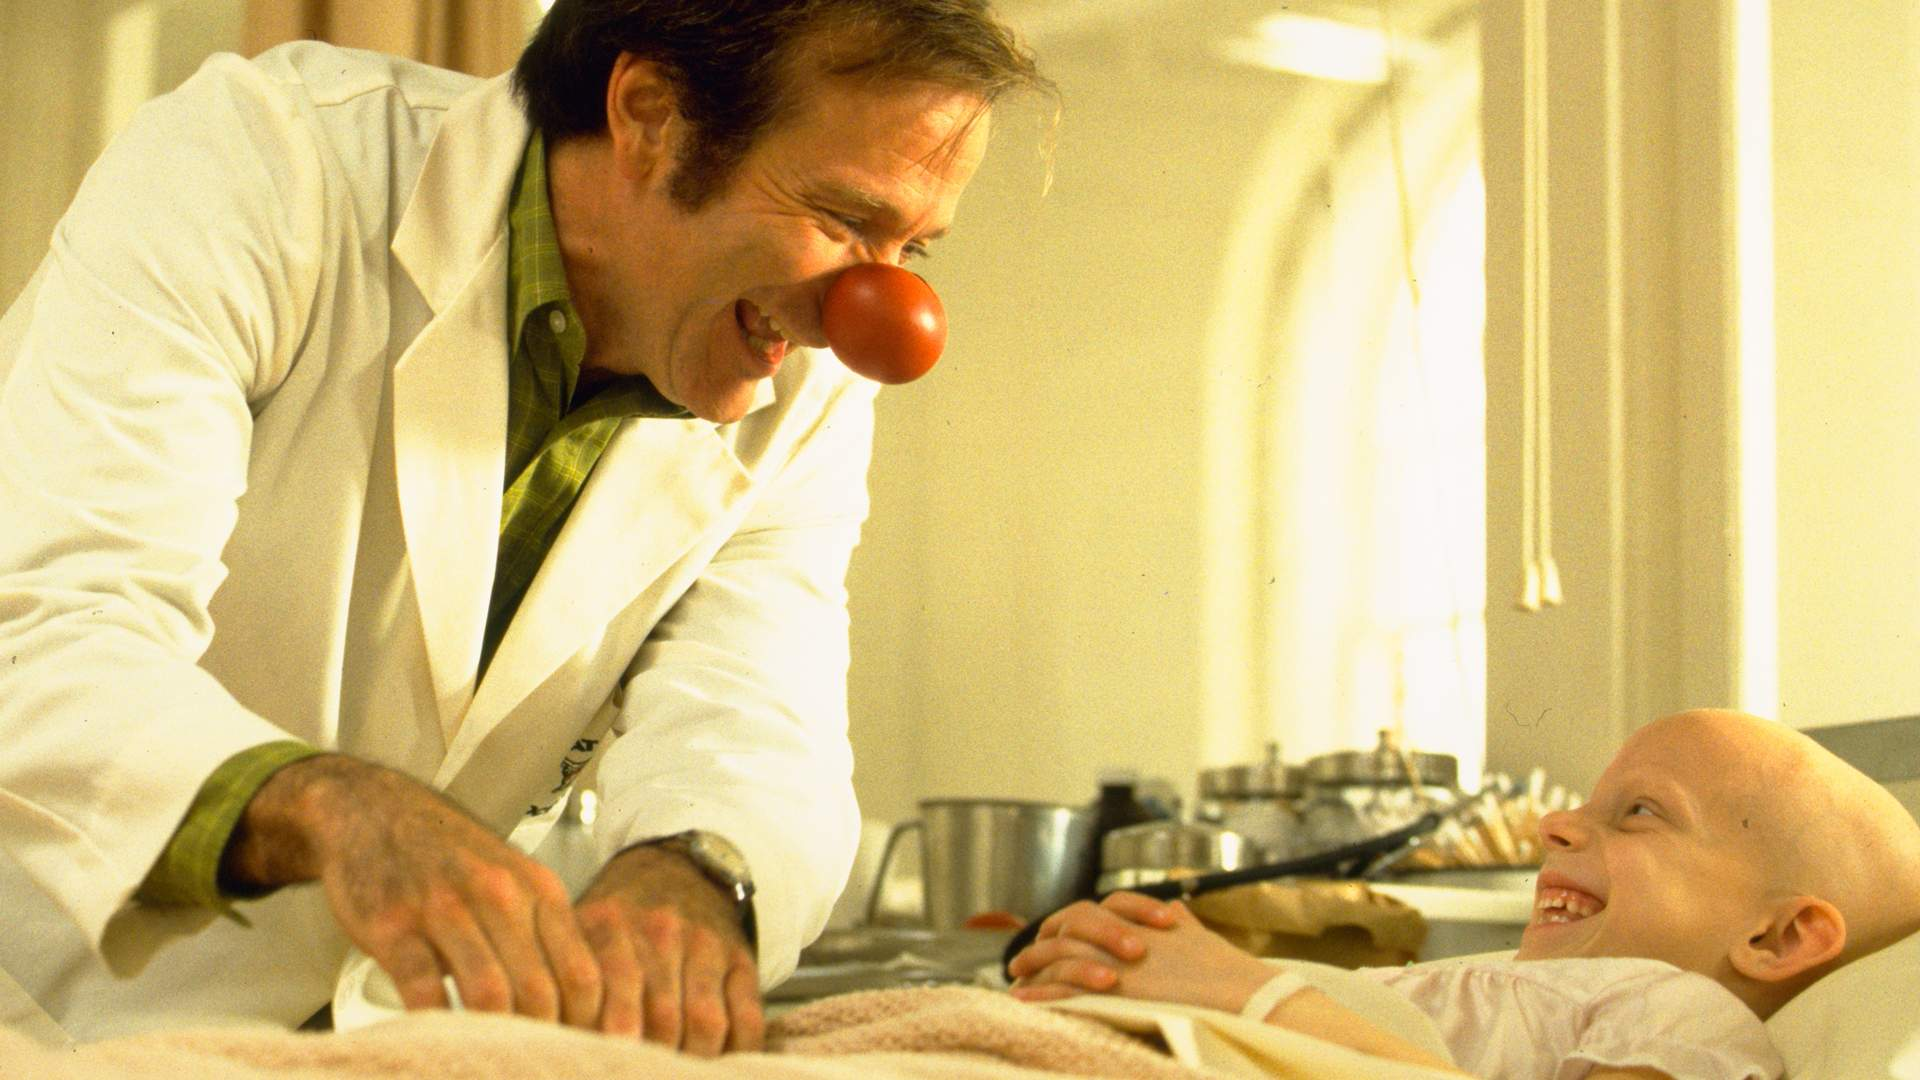 TOP 12: Filmy i seriale o lekarzach i medycynie